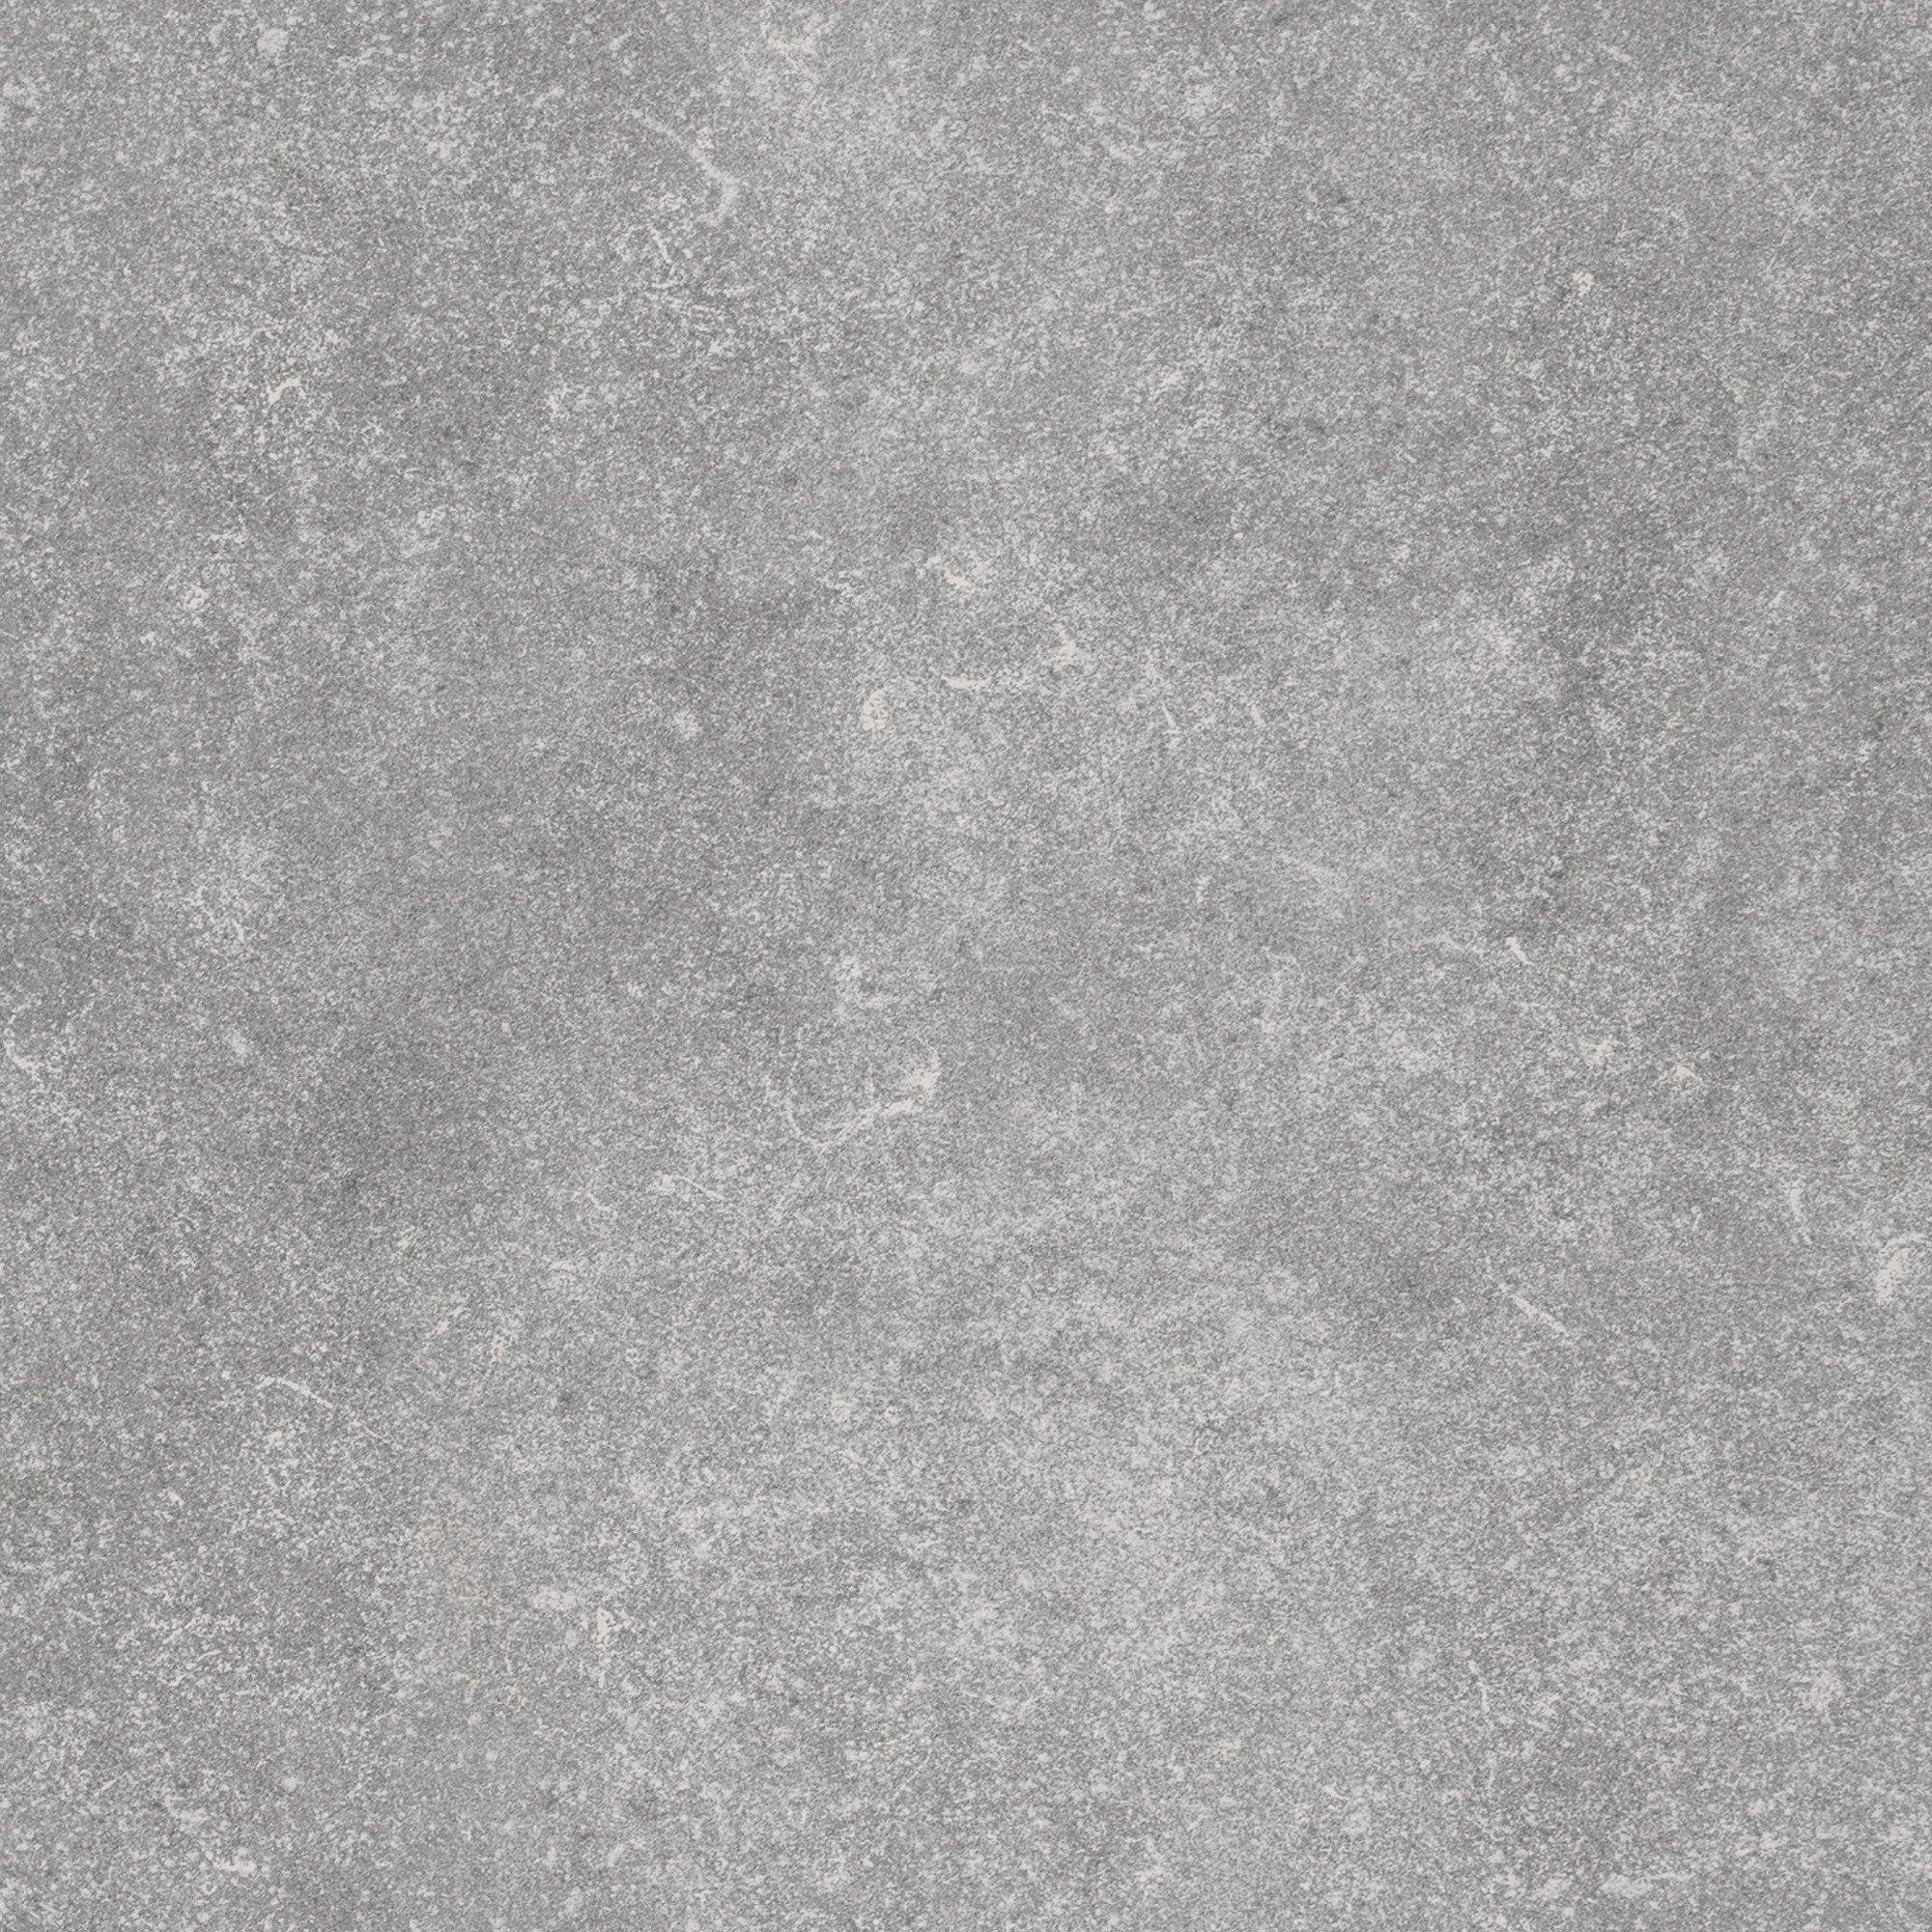 Wall Floor Tiles With Granite Effect Bluestone Buxy